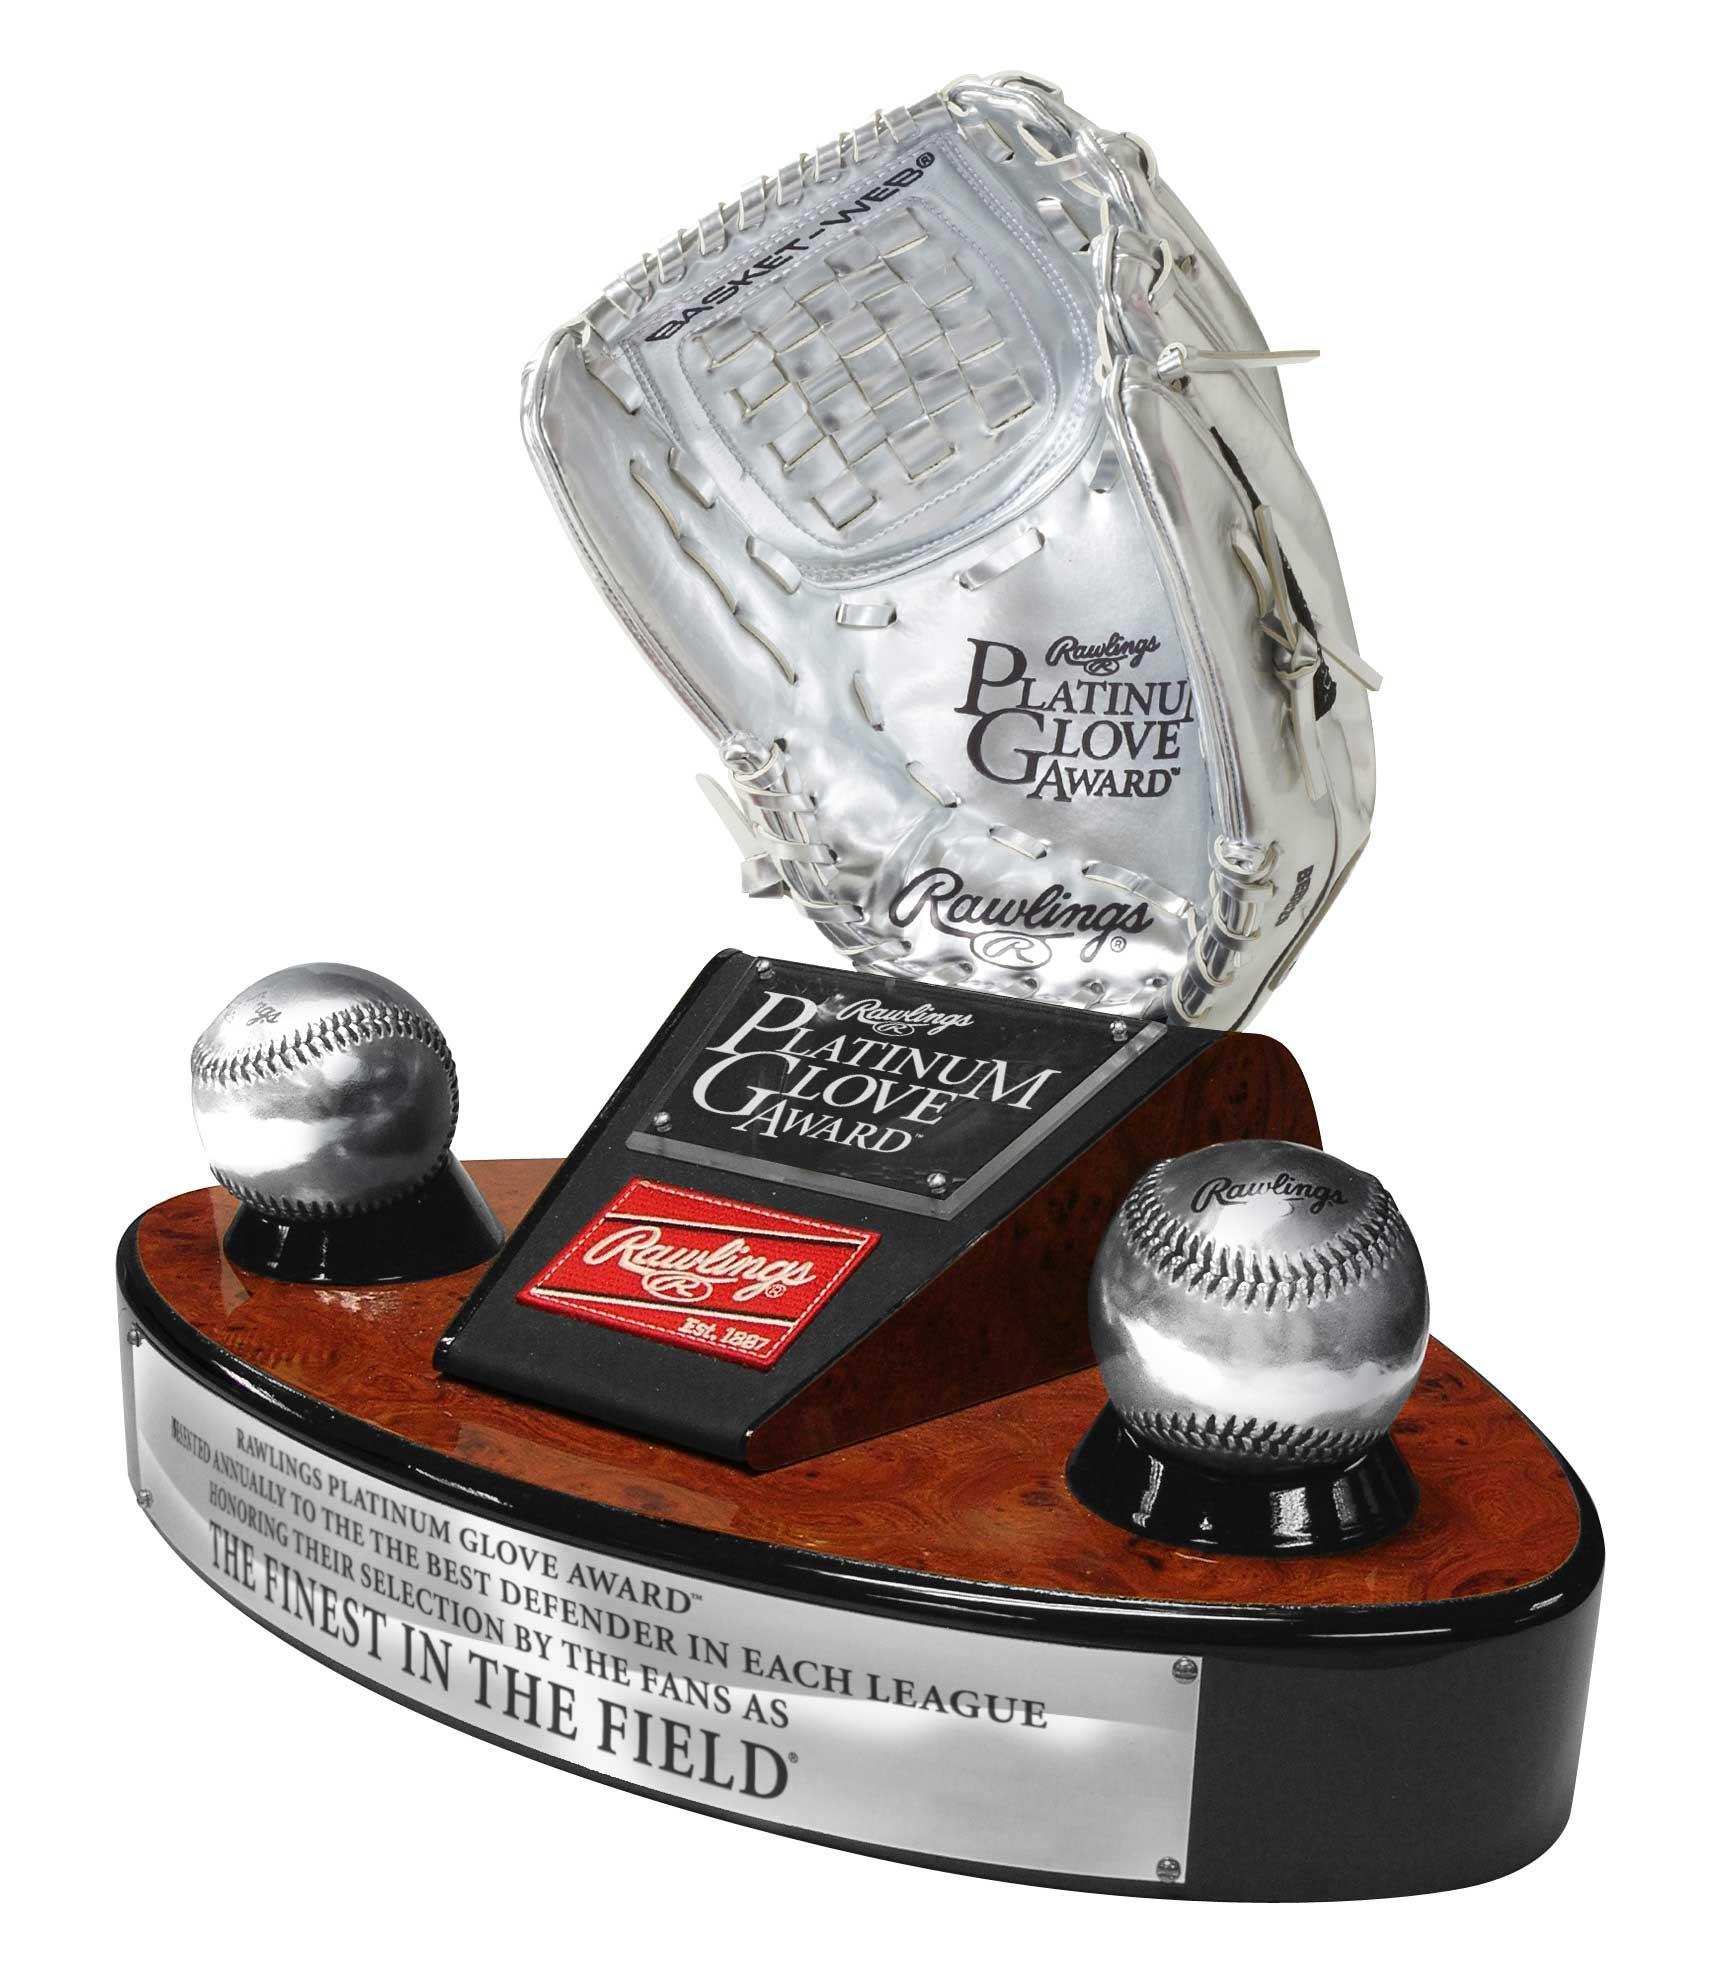 Platinum Glove Award